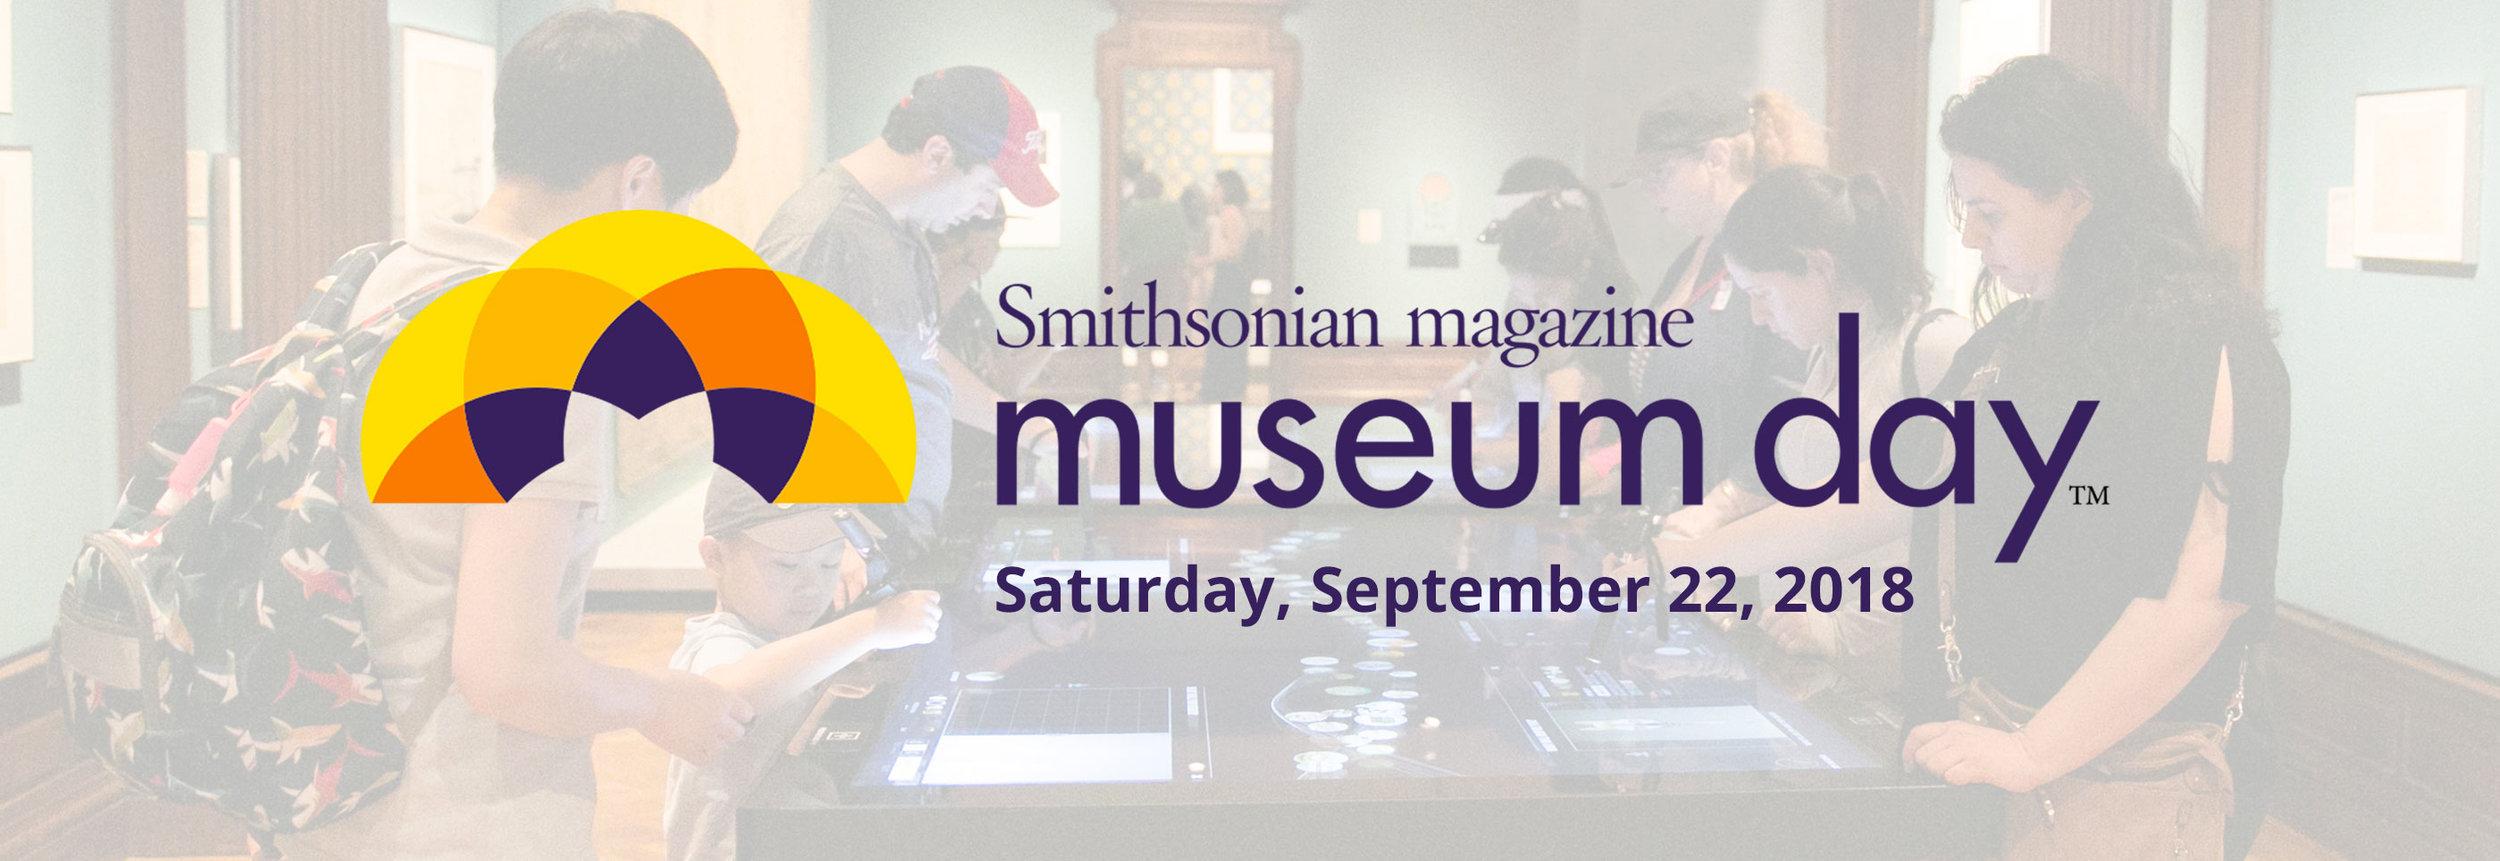 Museum Day Image.jpg